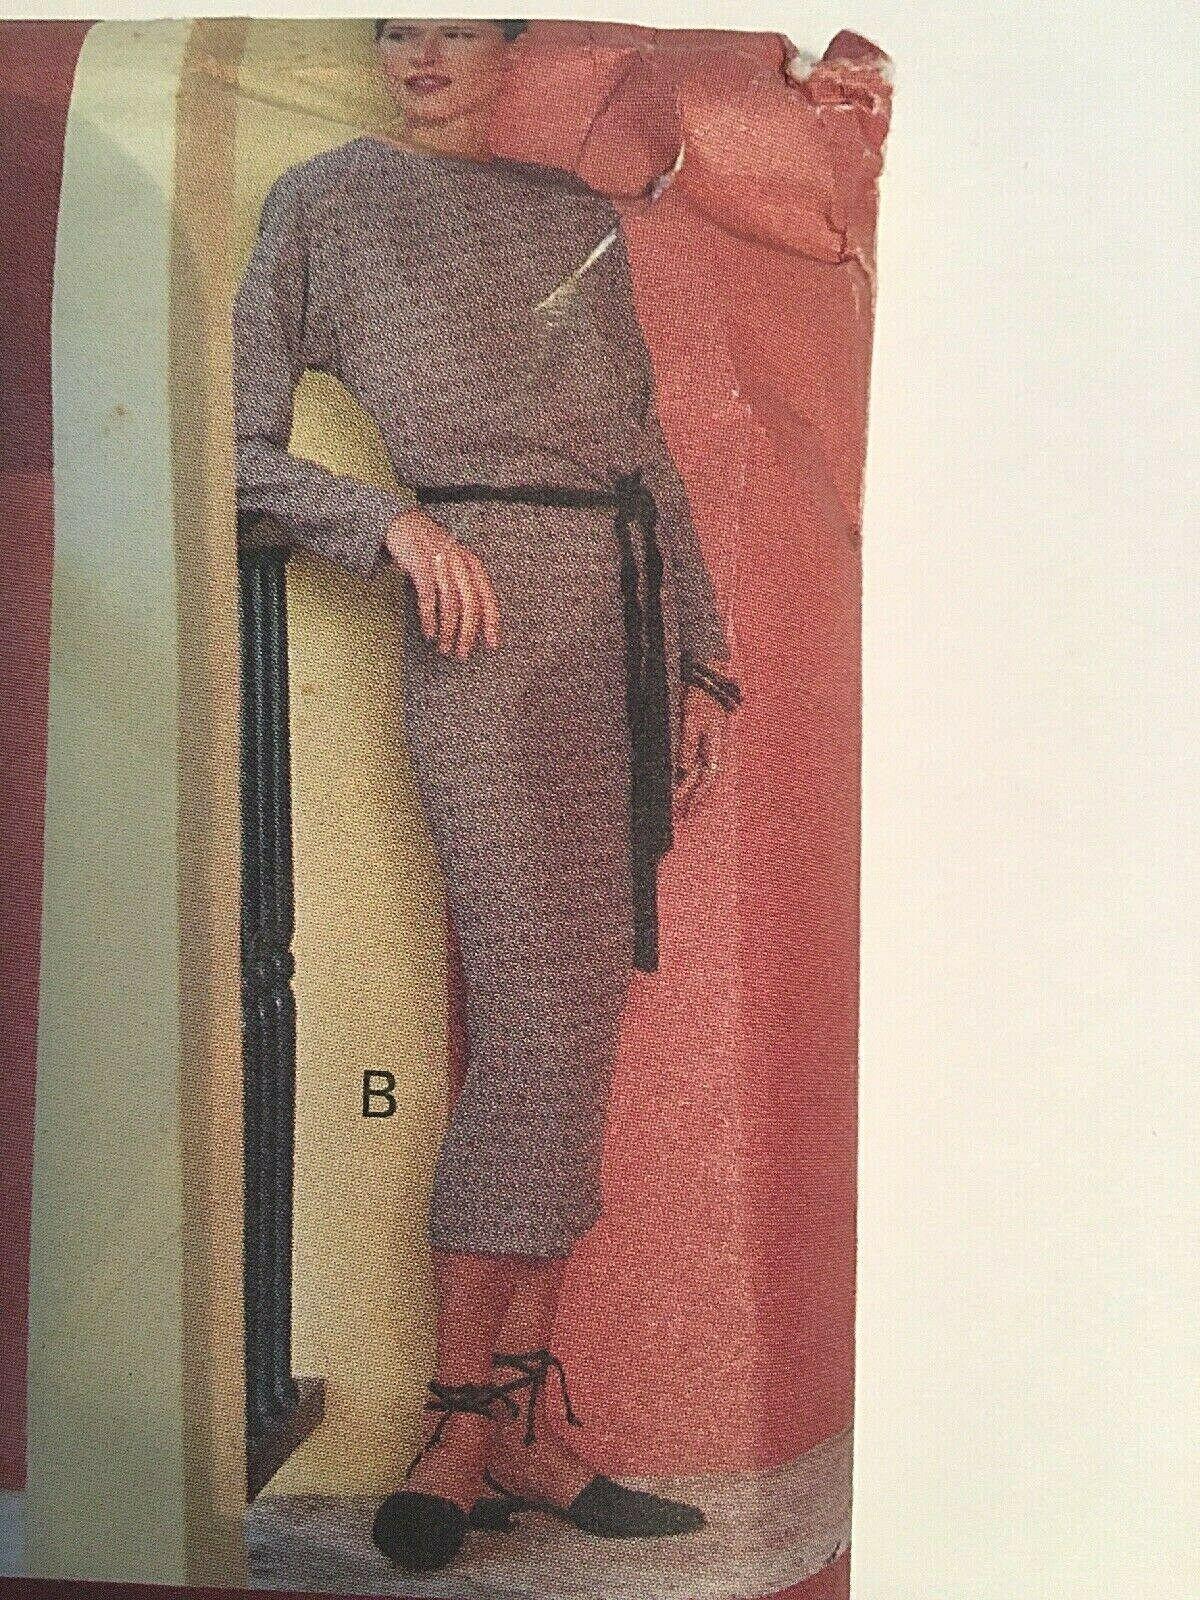 Vogue Sewing Pattern  # 1426 SZ 20-22-24 Dress, Top, Pants, Skirt. Jacket Uncut image 4